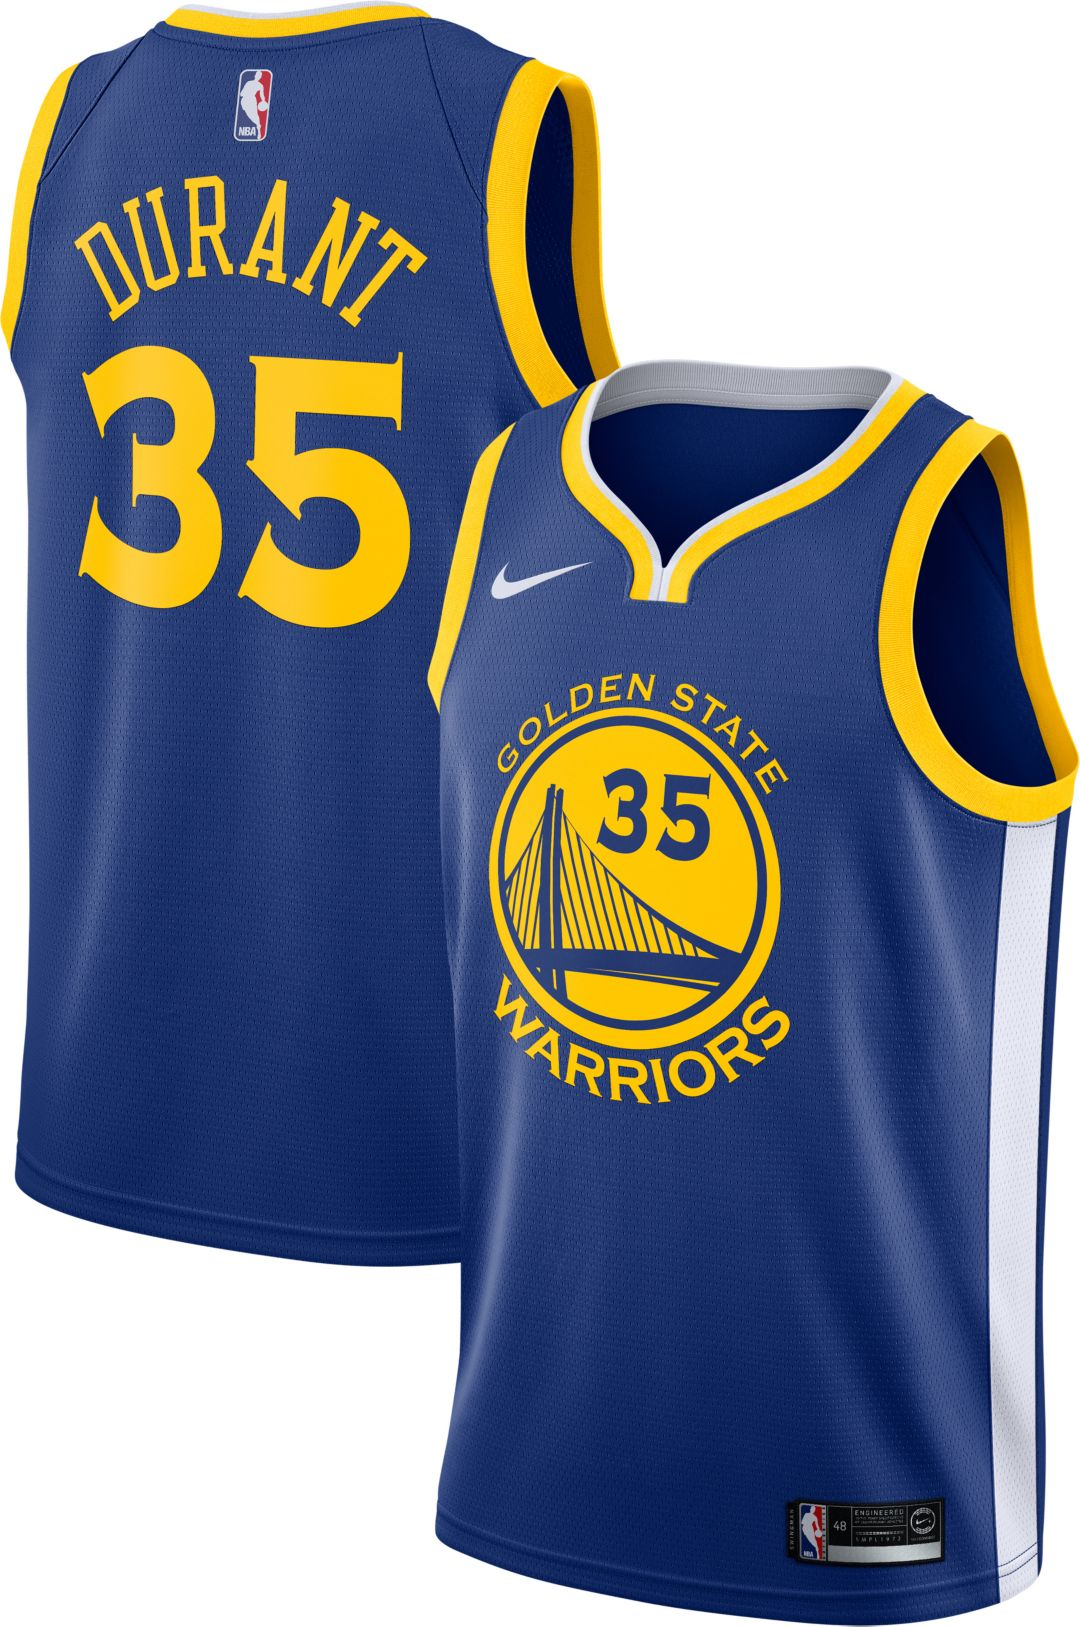 abff446a65f Nike Men's Golden State Warriors Kevin Durant #35 Royal Dri-FIT Swingman  Jersey 1